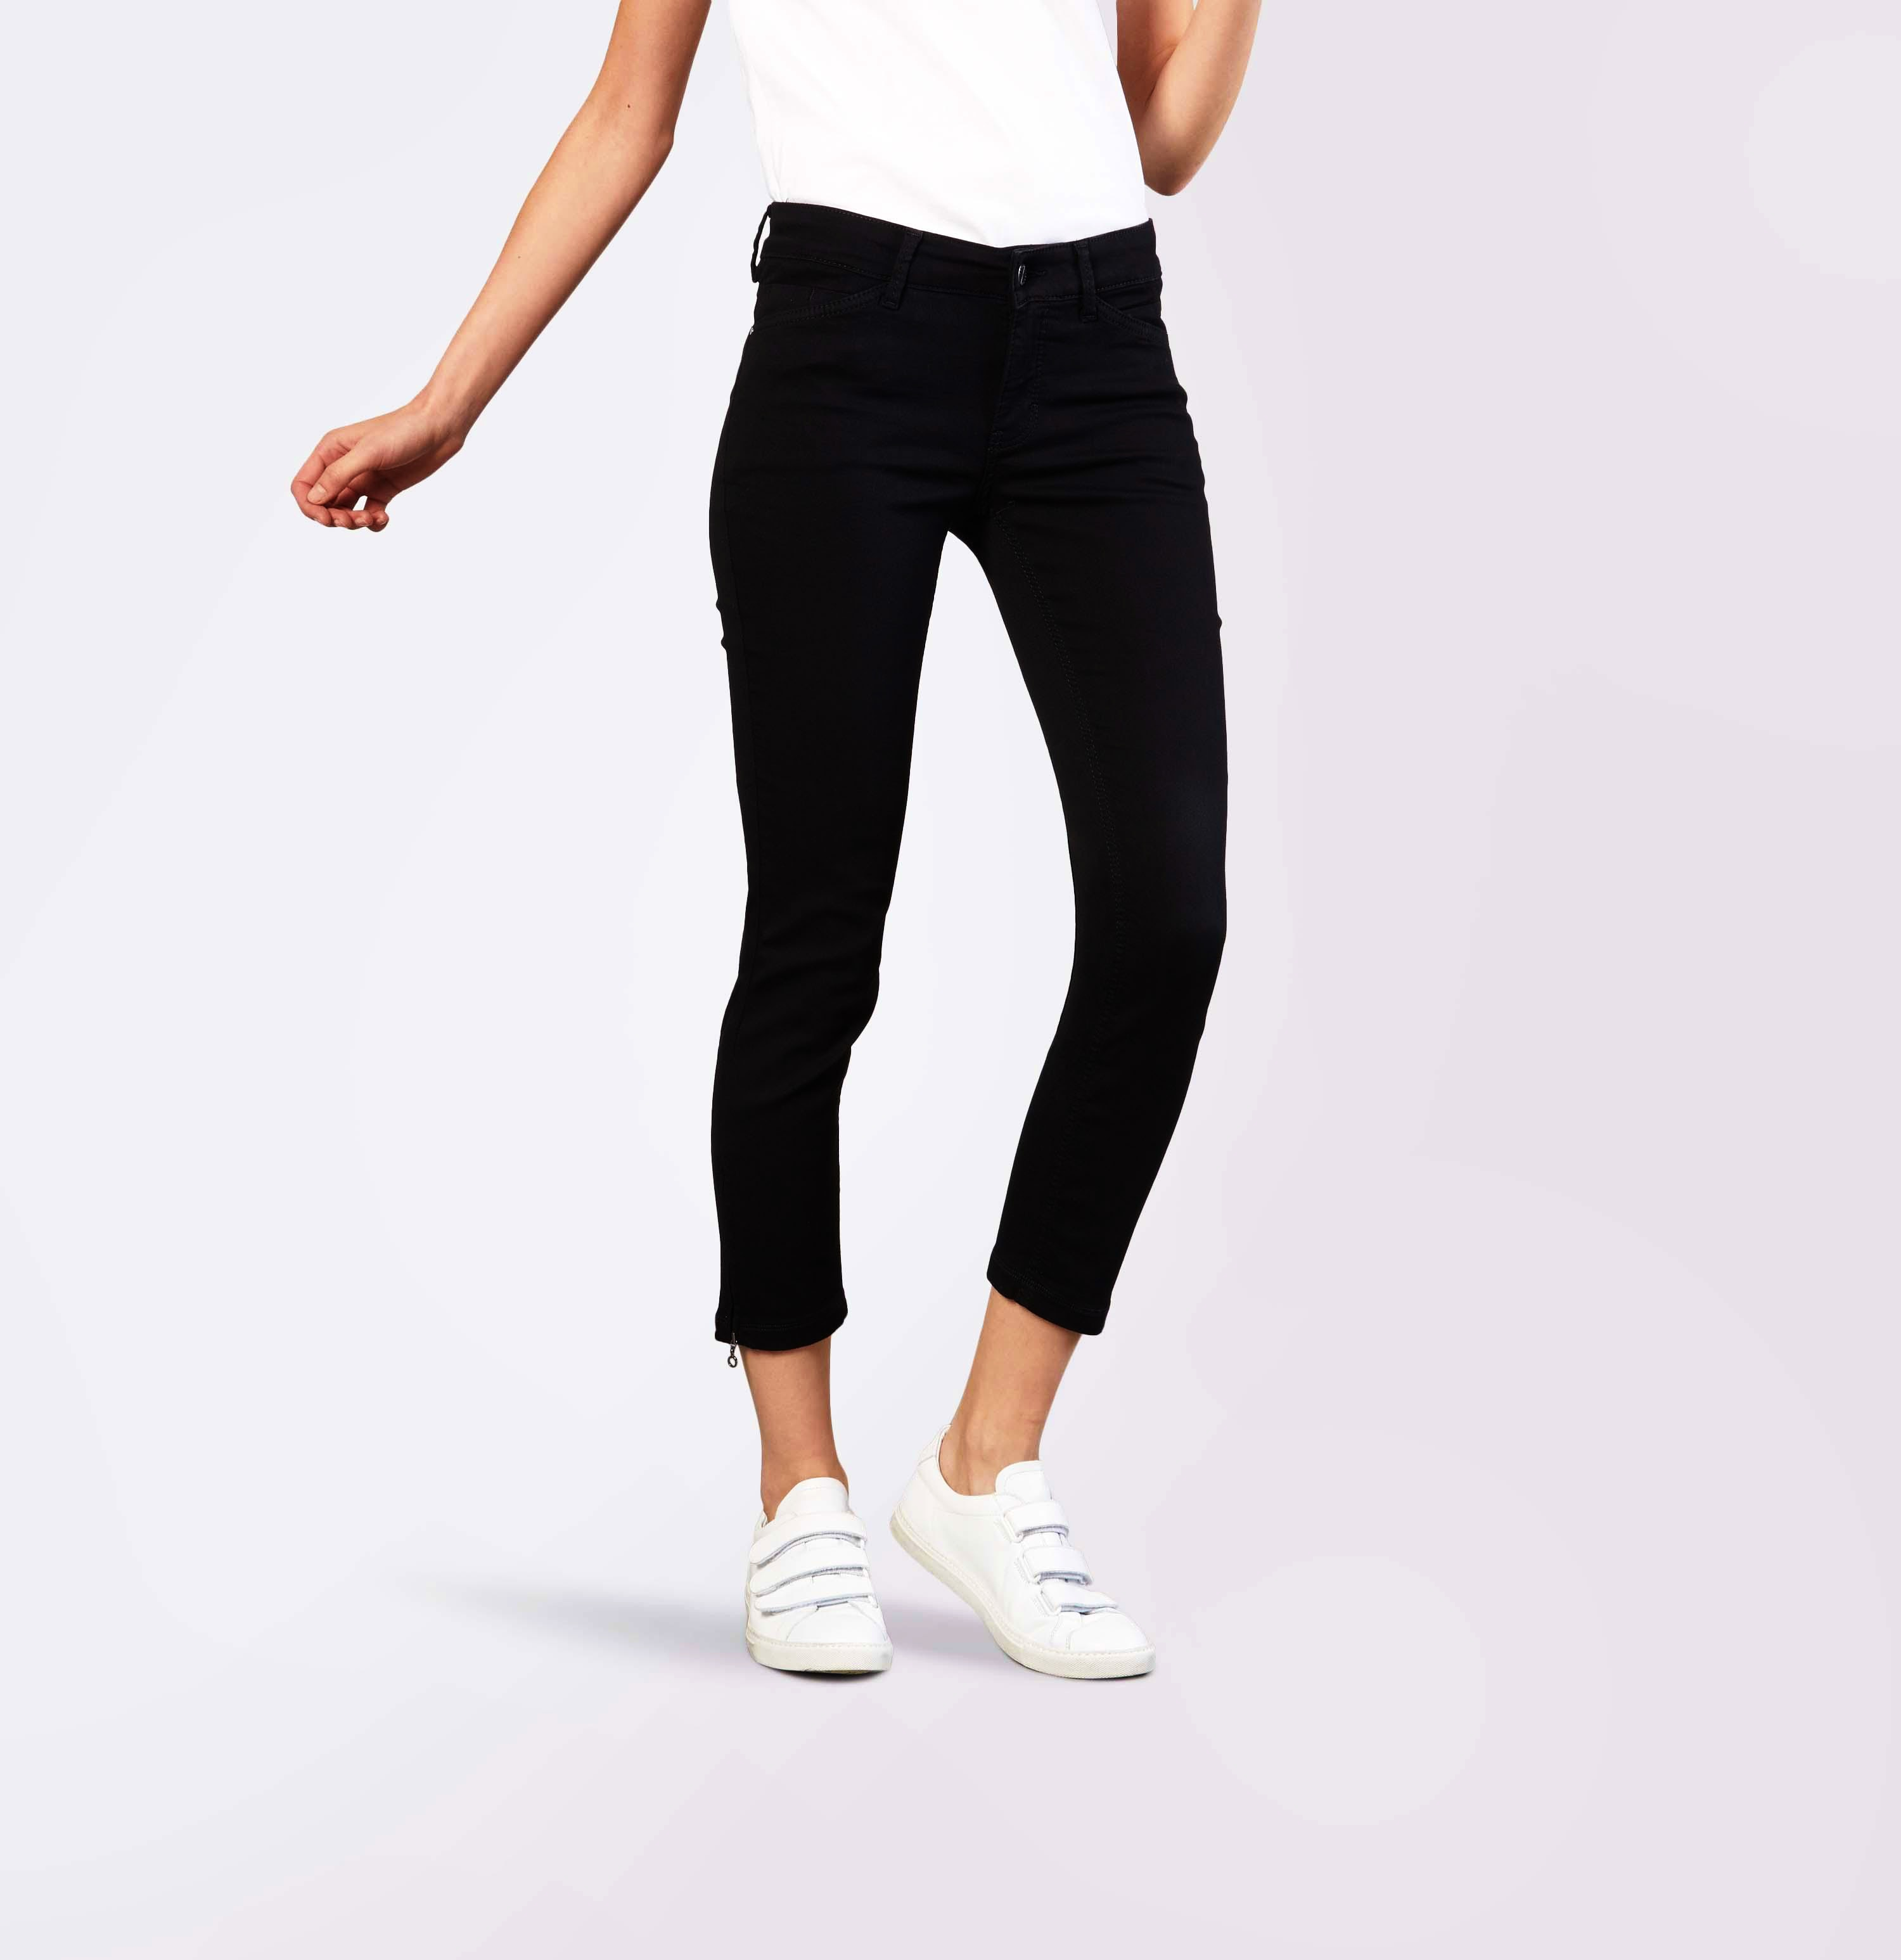 MAC Jeans Dream Chic black